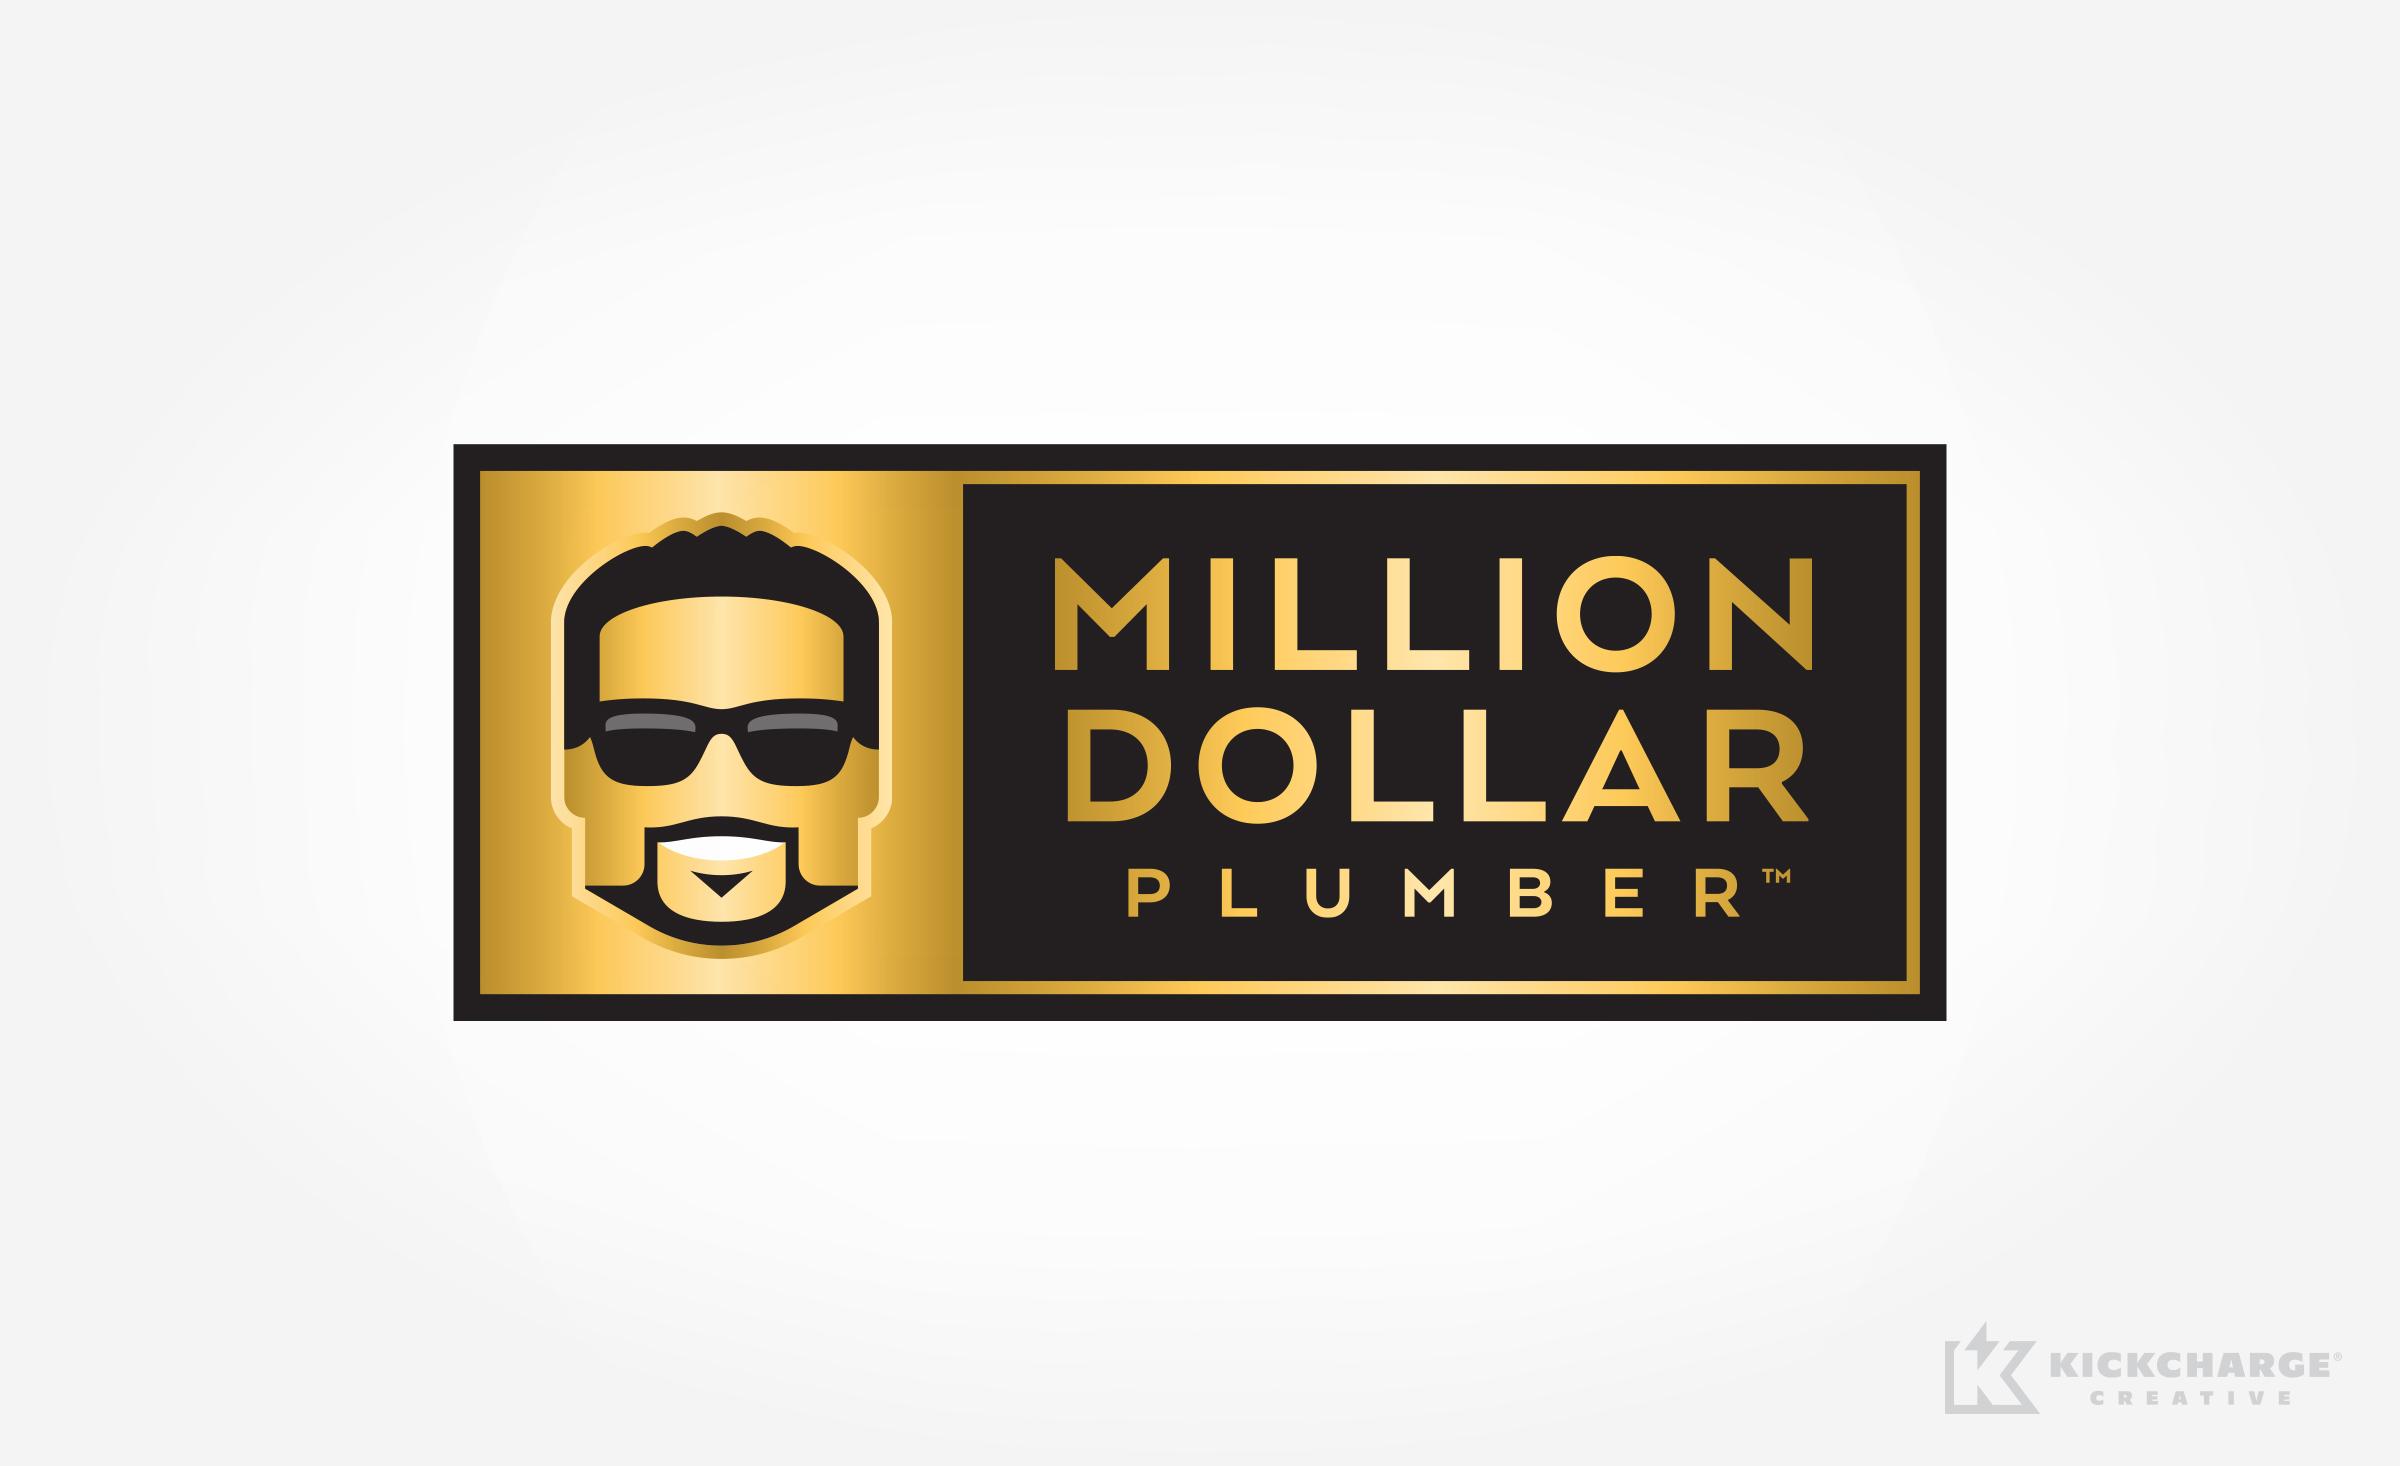 Million Dollar Plumber